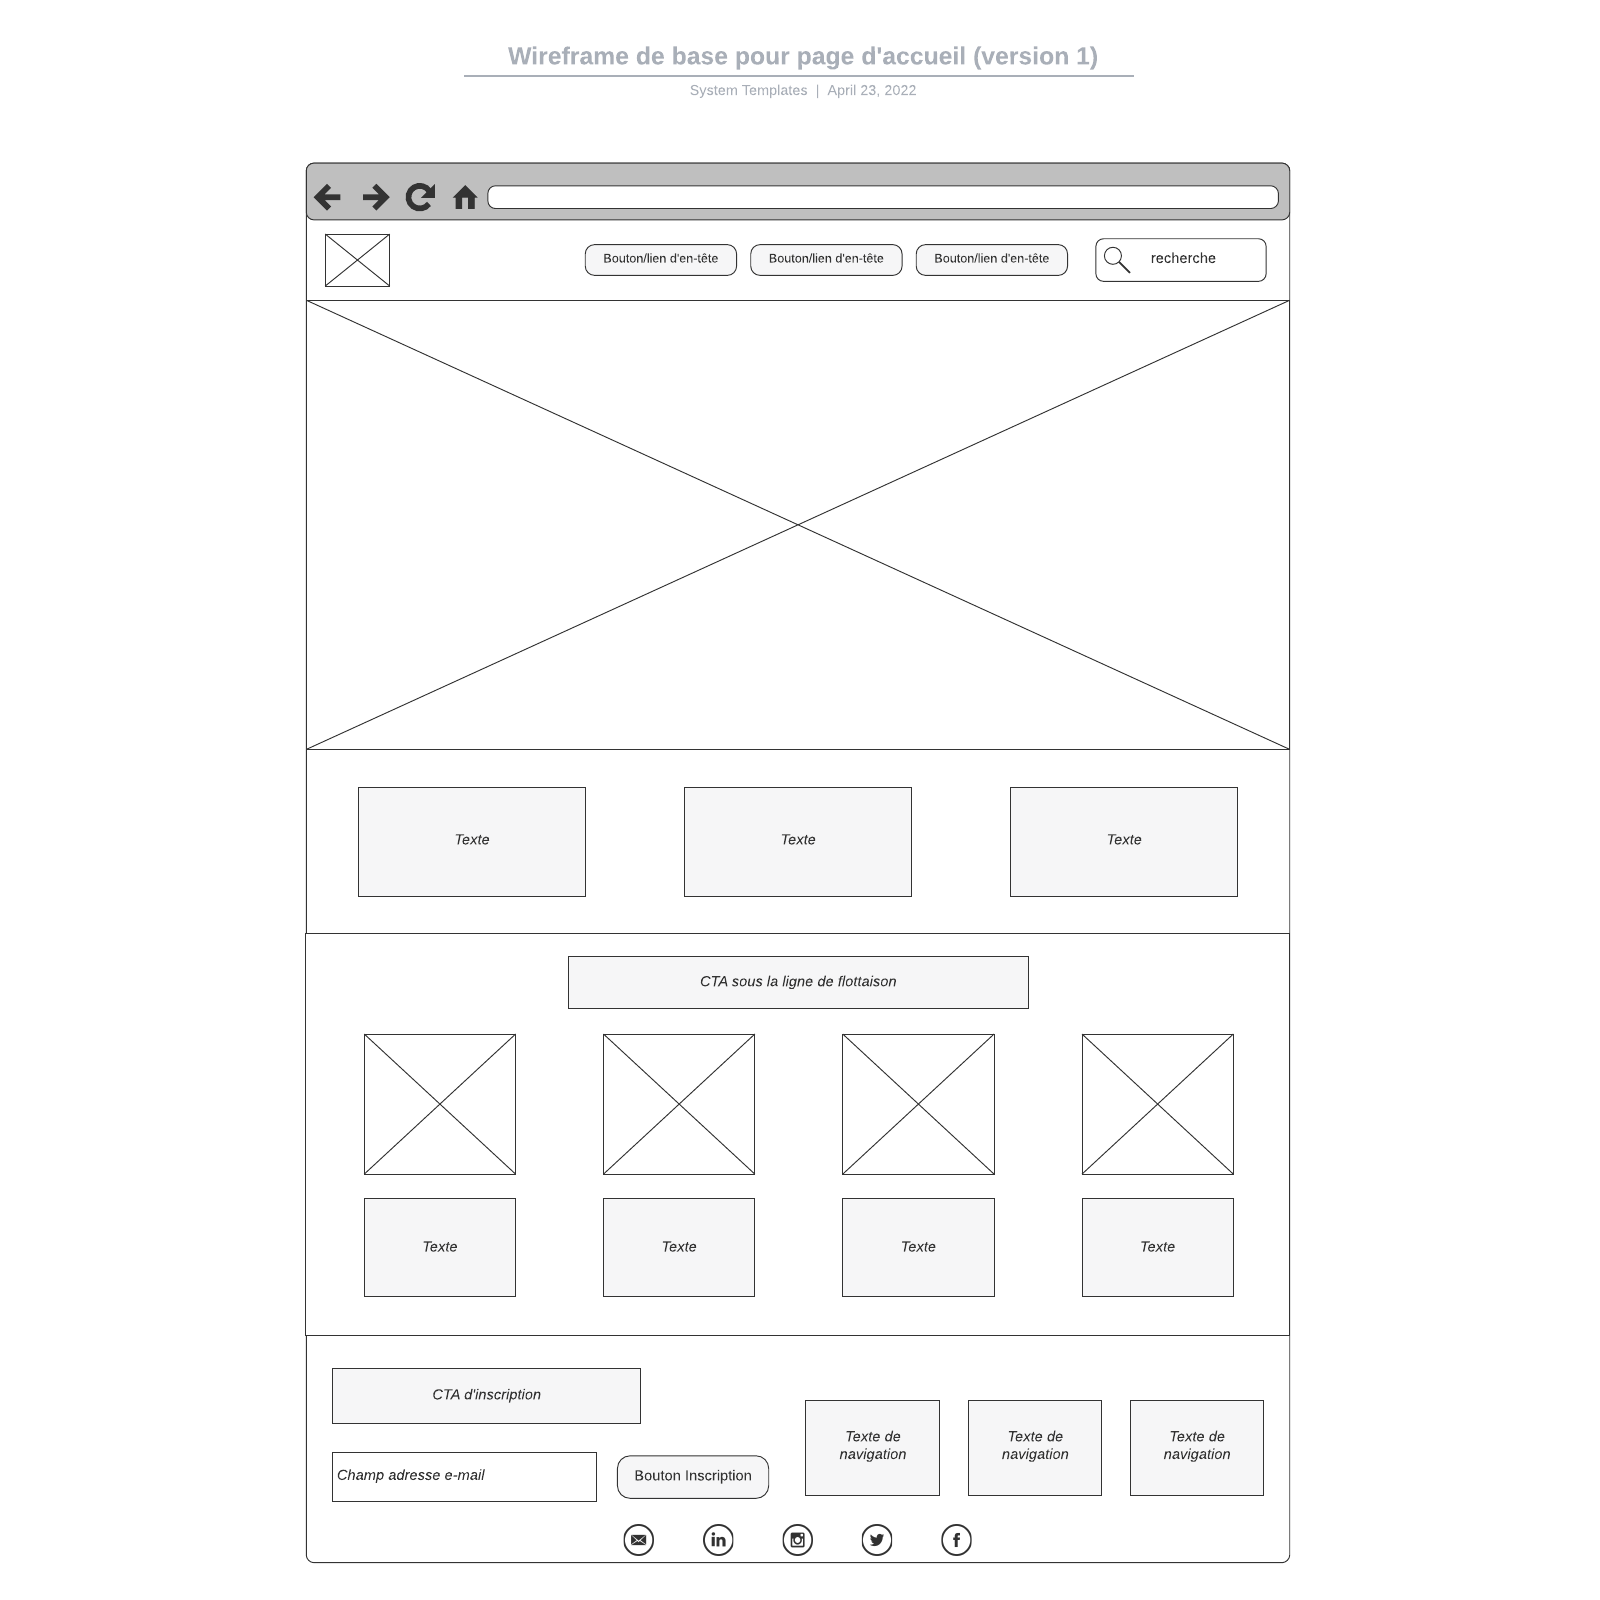 exemple de wireframe simple pour page d'accueil